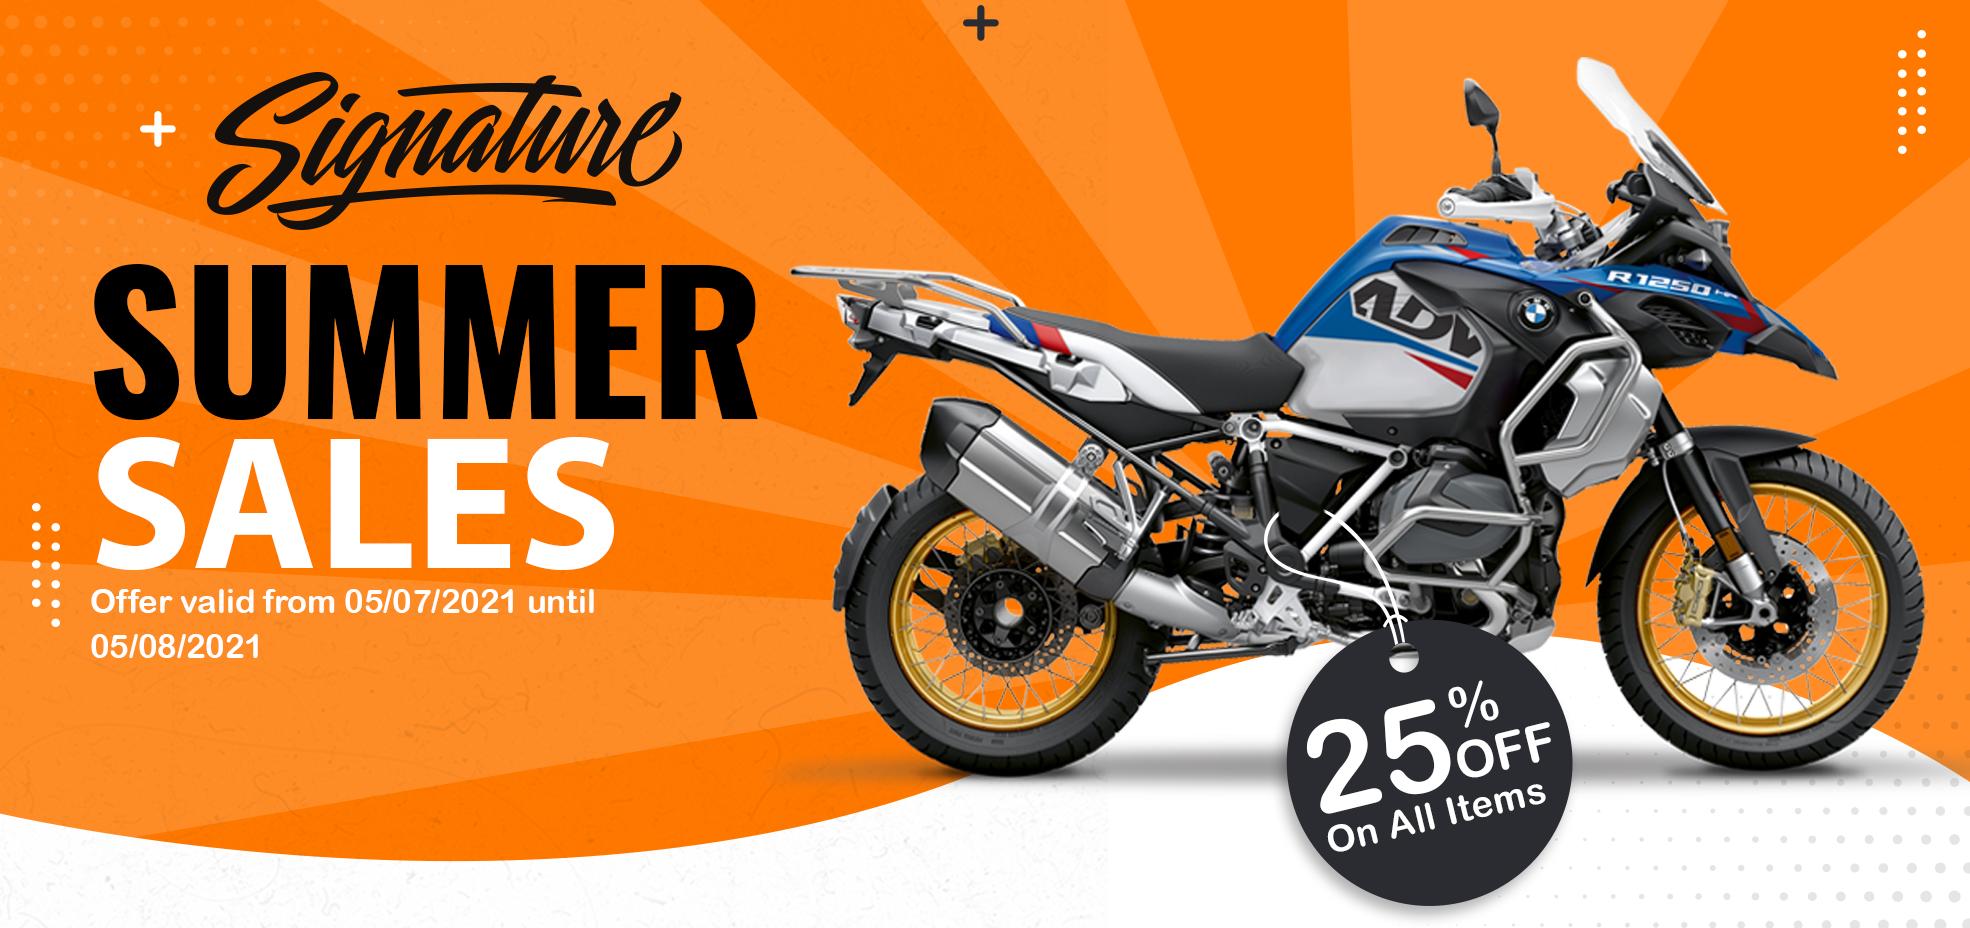 scd summer sales 2021 website slider